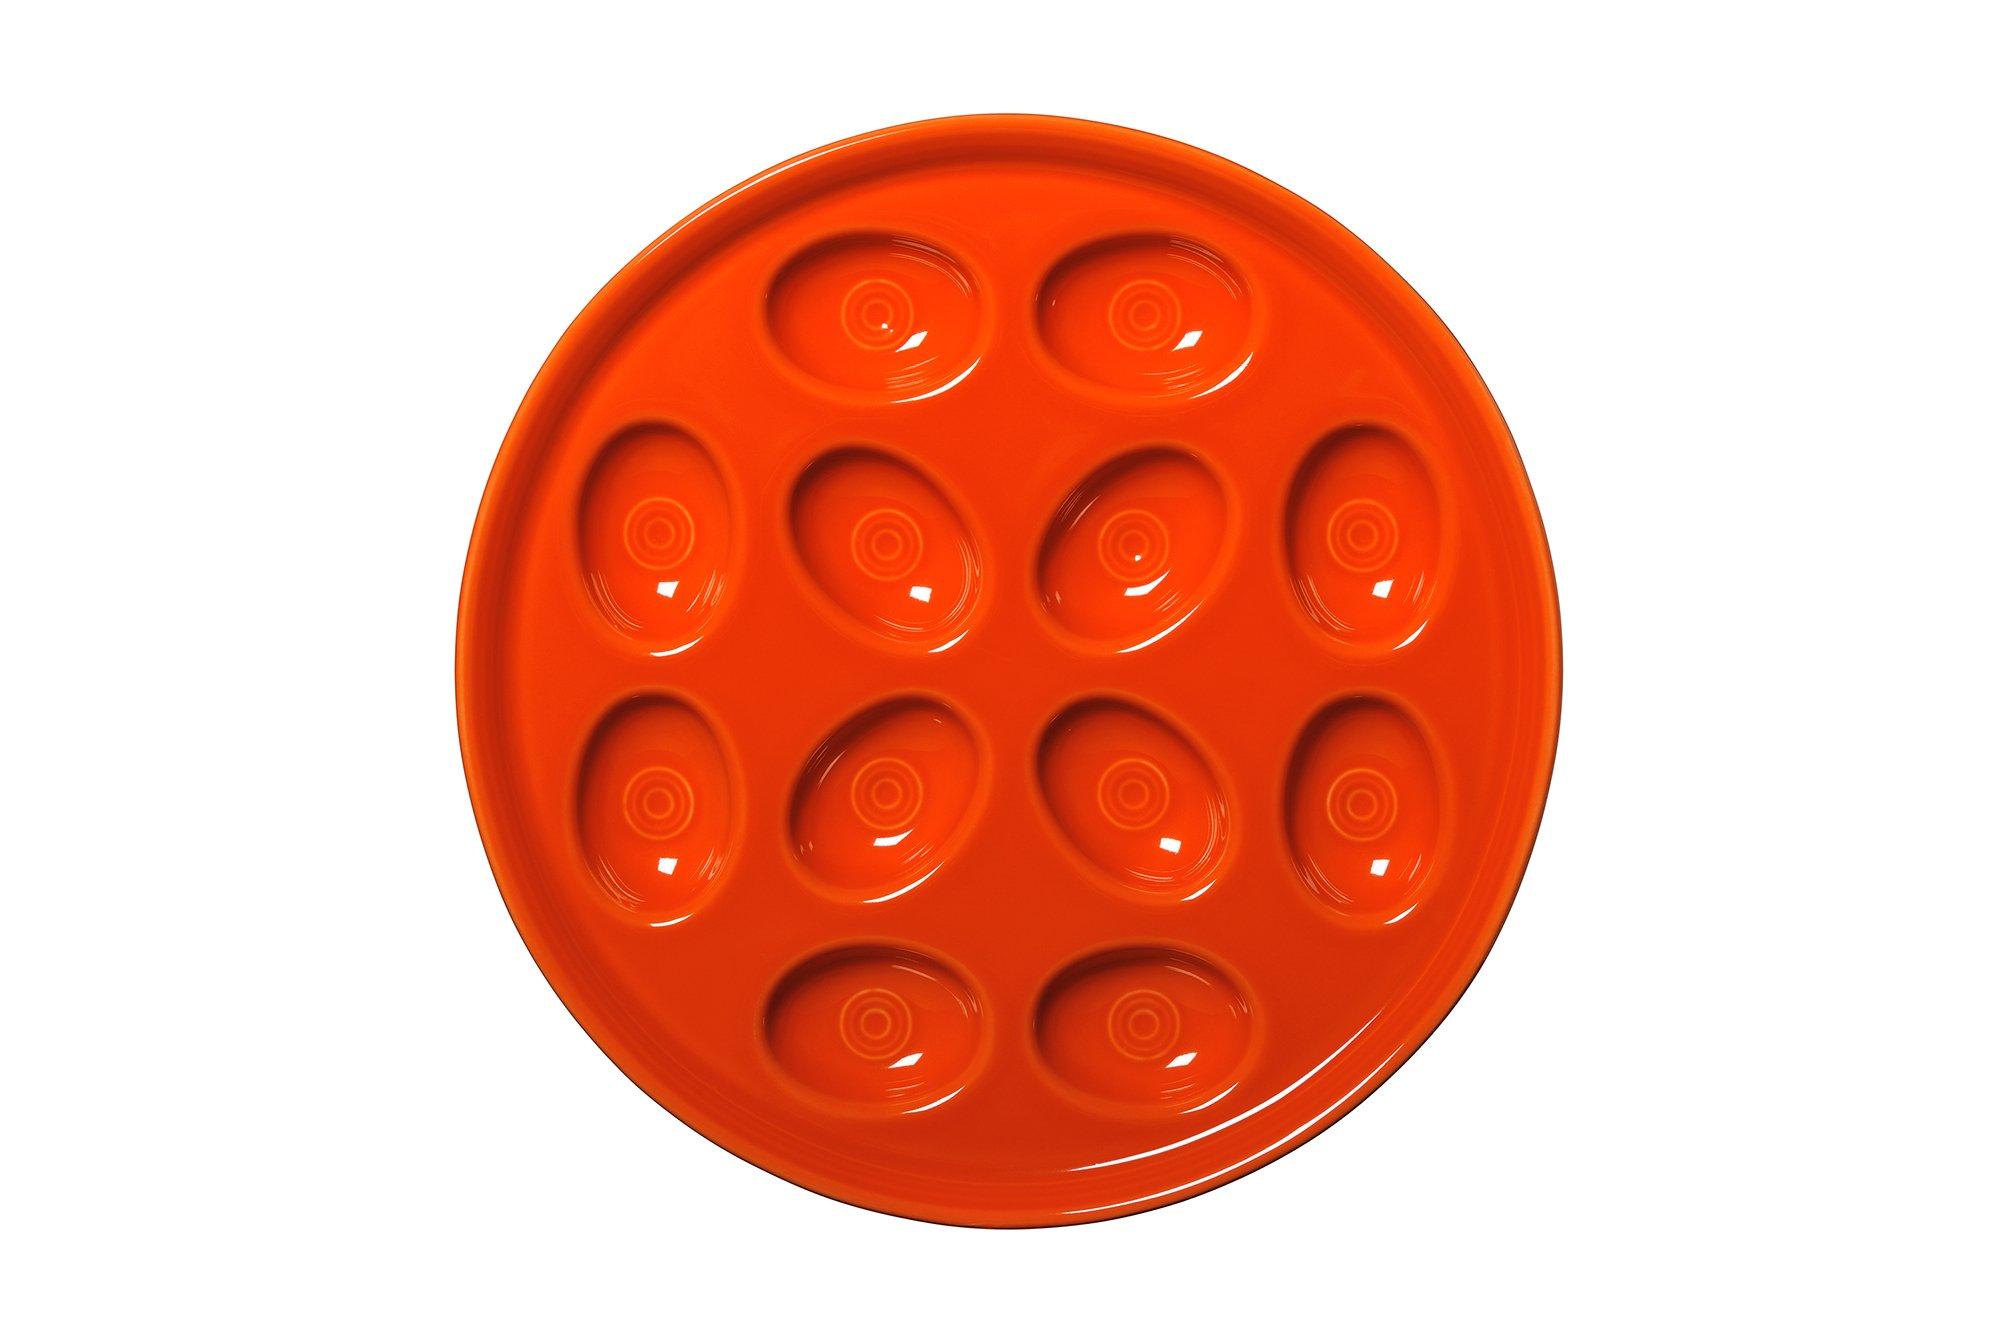 Fiesta Egg Tray, 11-Inch, Poppy by Fiesta (Image #1)